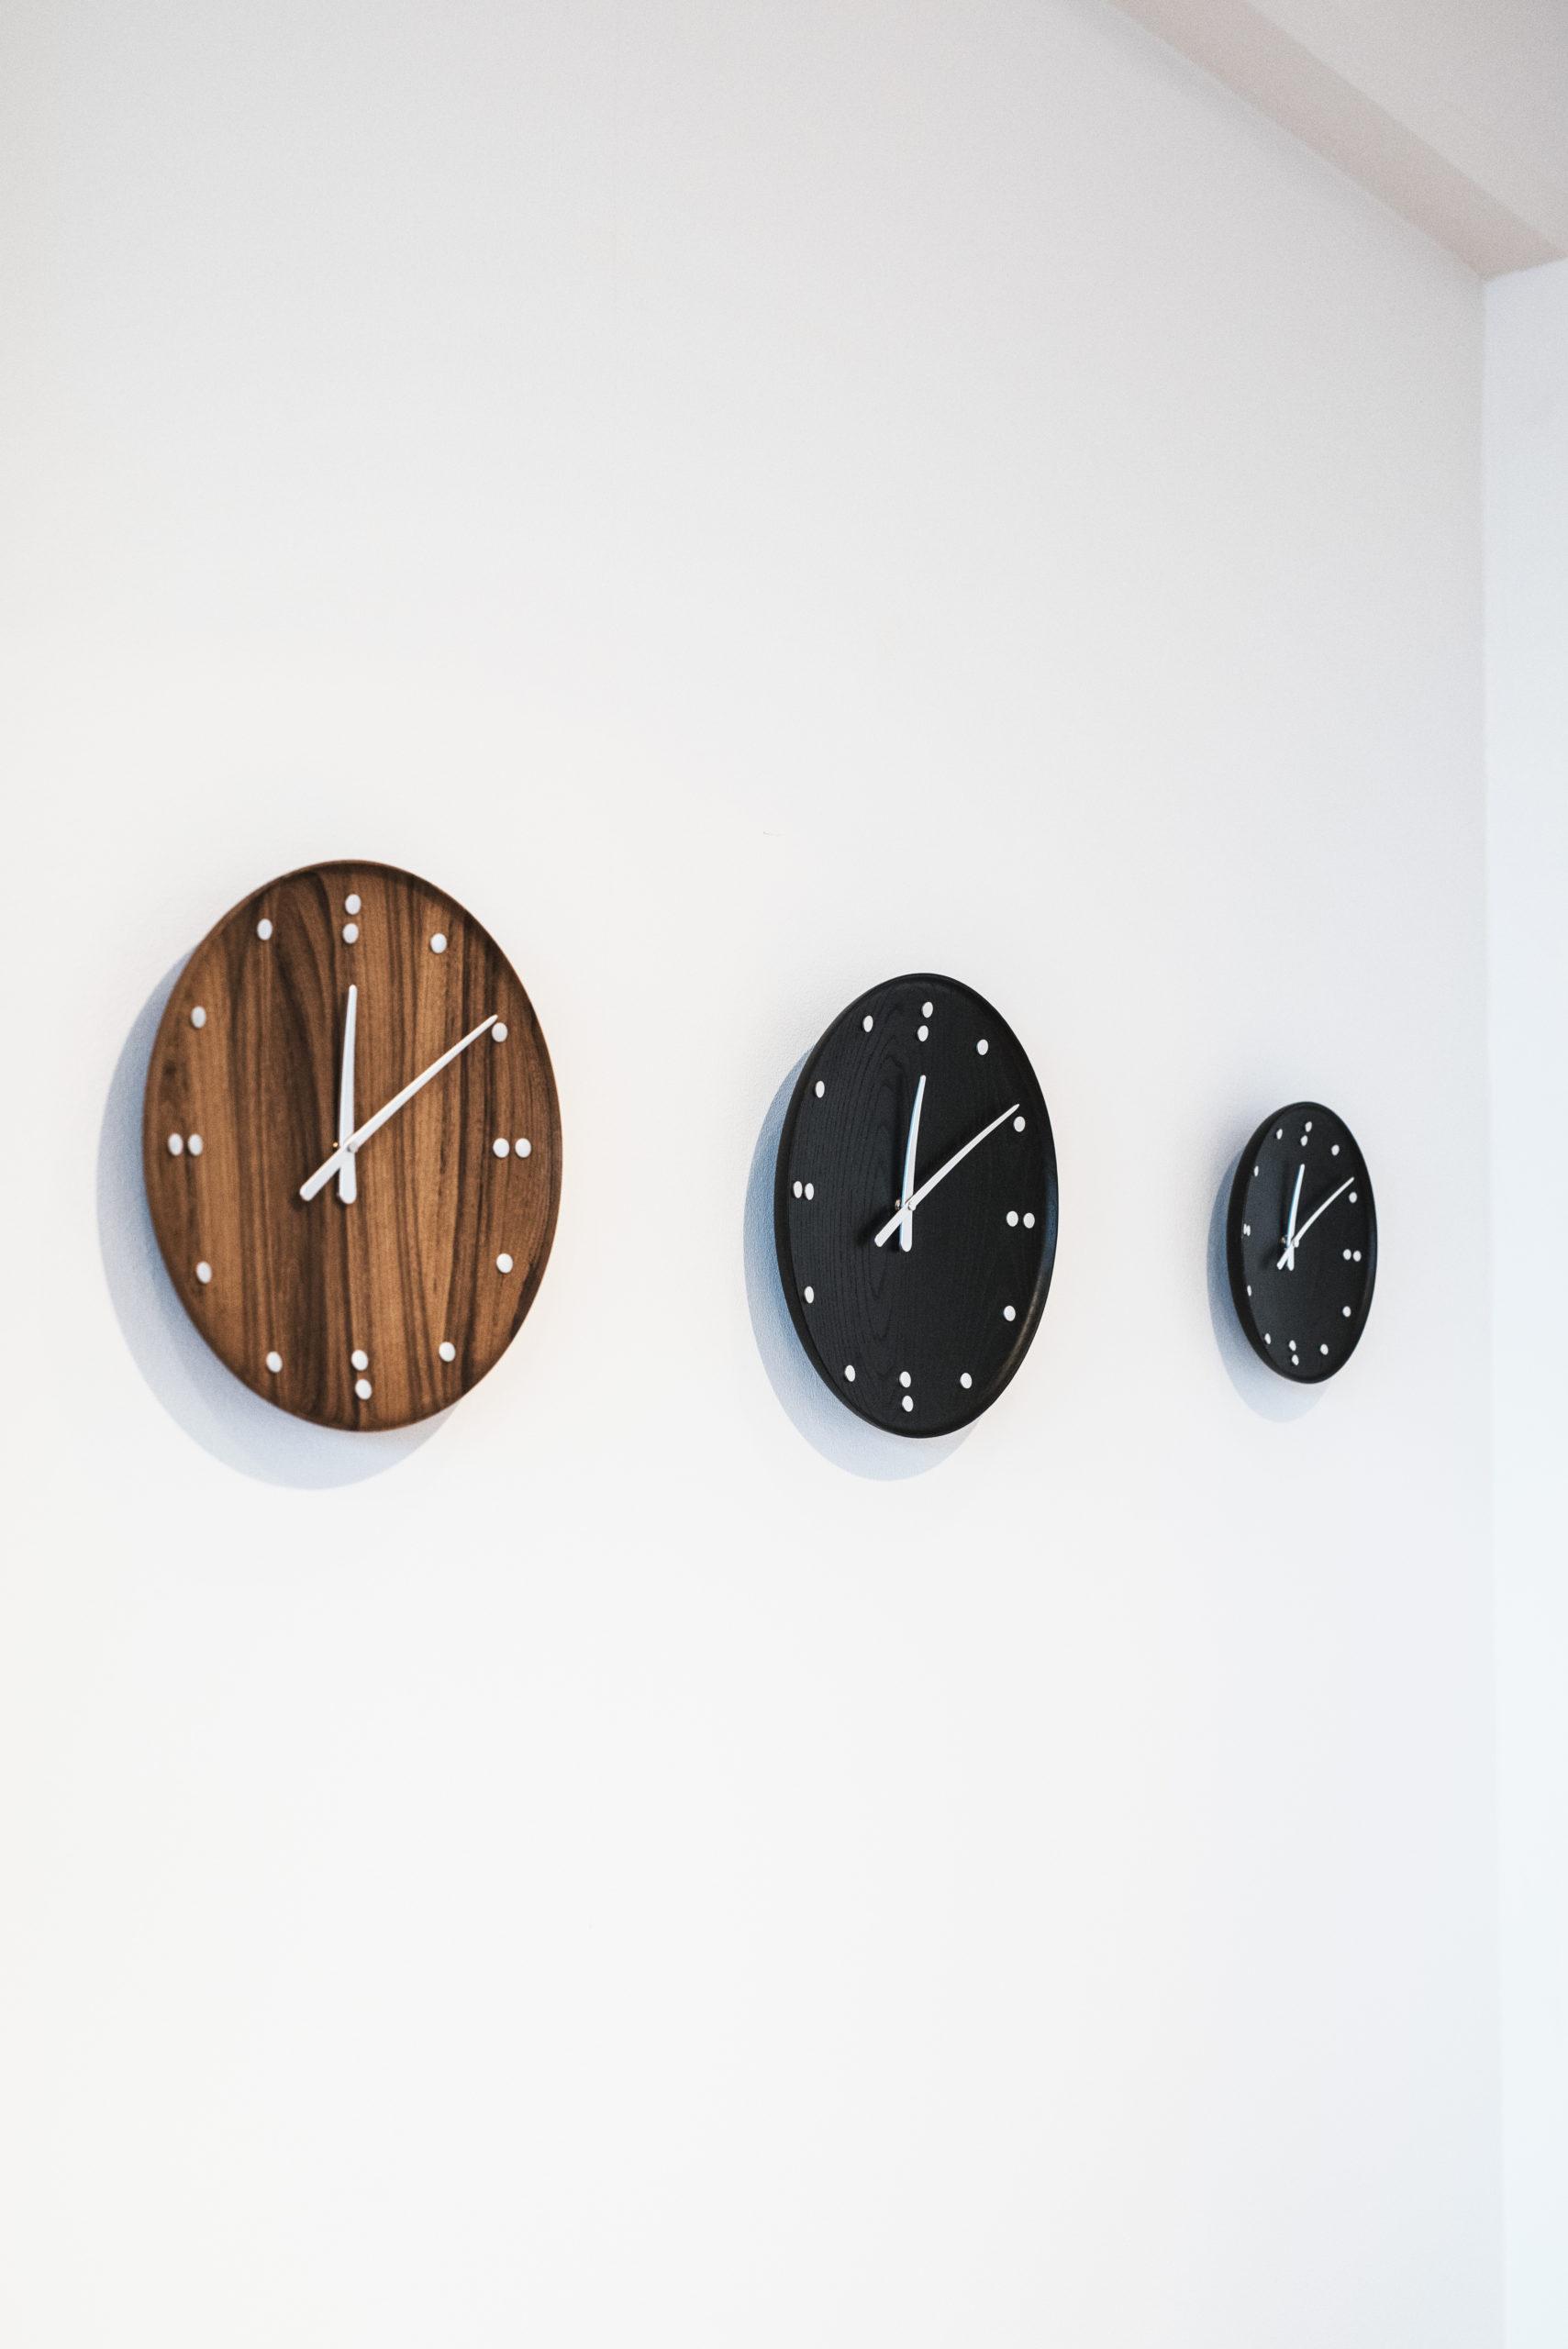 Architectmade-FJ-Clock-Wall-Clock-Teak-and-Ash-Wood-Denmark-Finn-Juhl-8